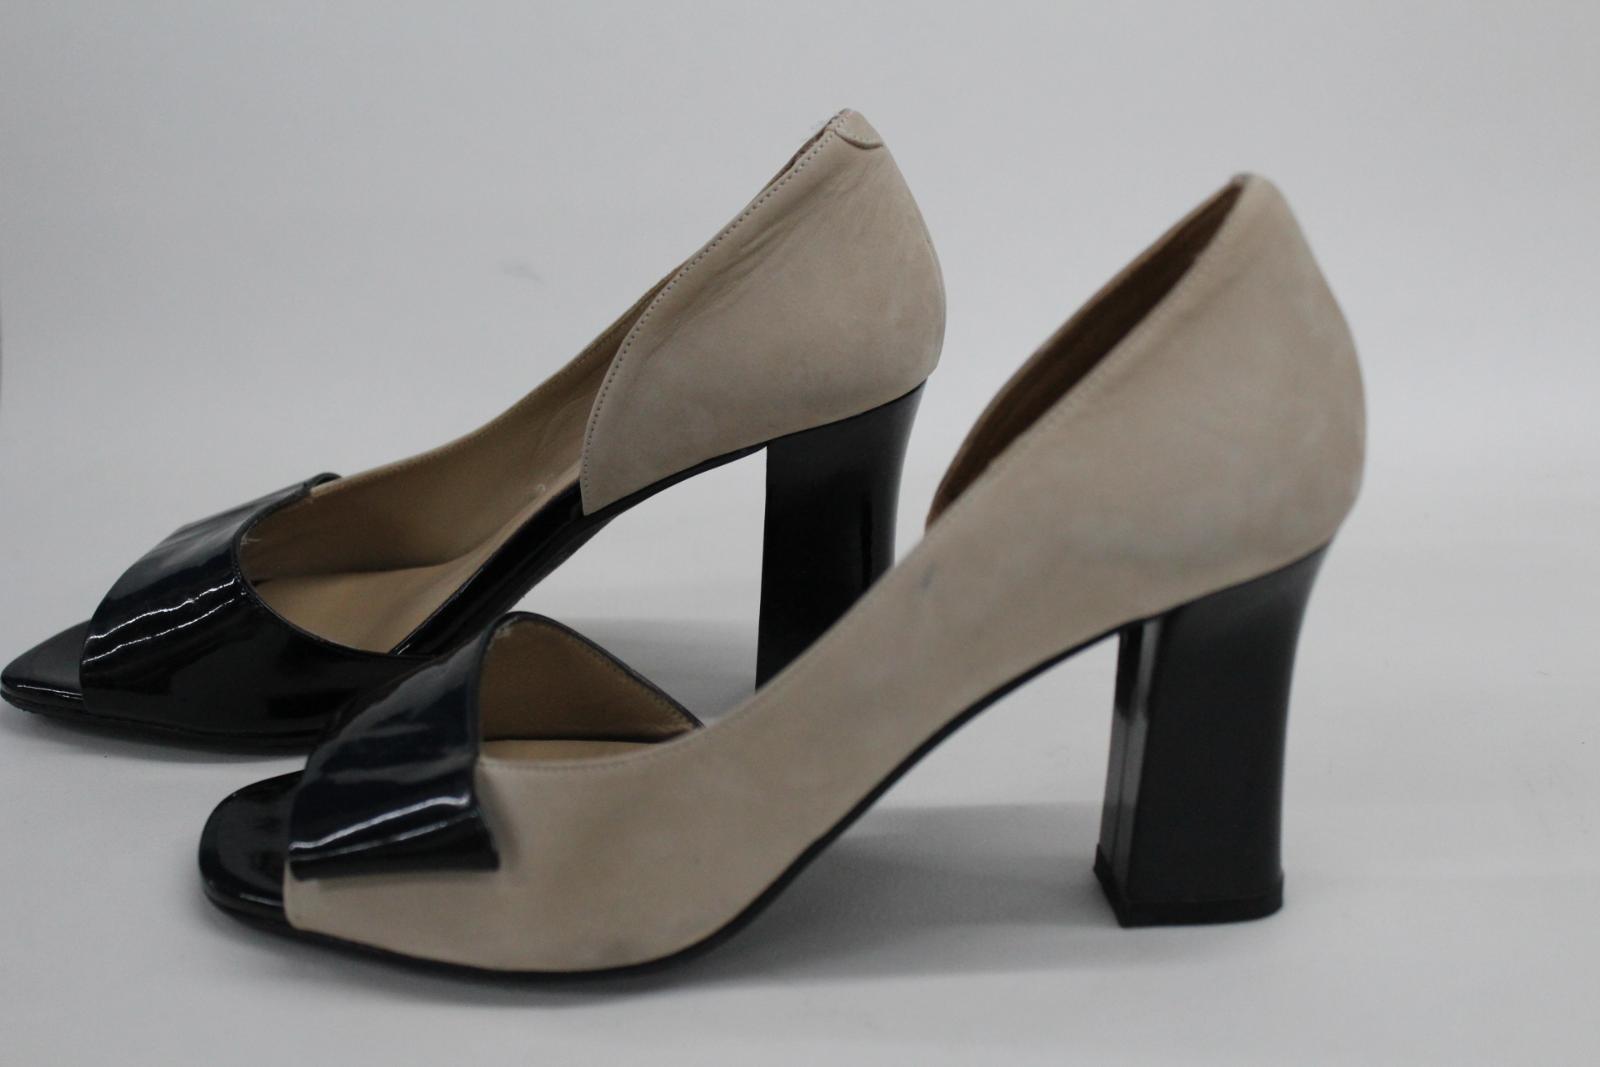 AUDLEY-London-Beige-Leather-Open-Peep-Toe-Bloc-Heel-Court-Shoes-EU39-UK6 thumbnail 6